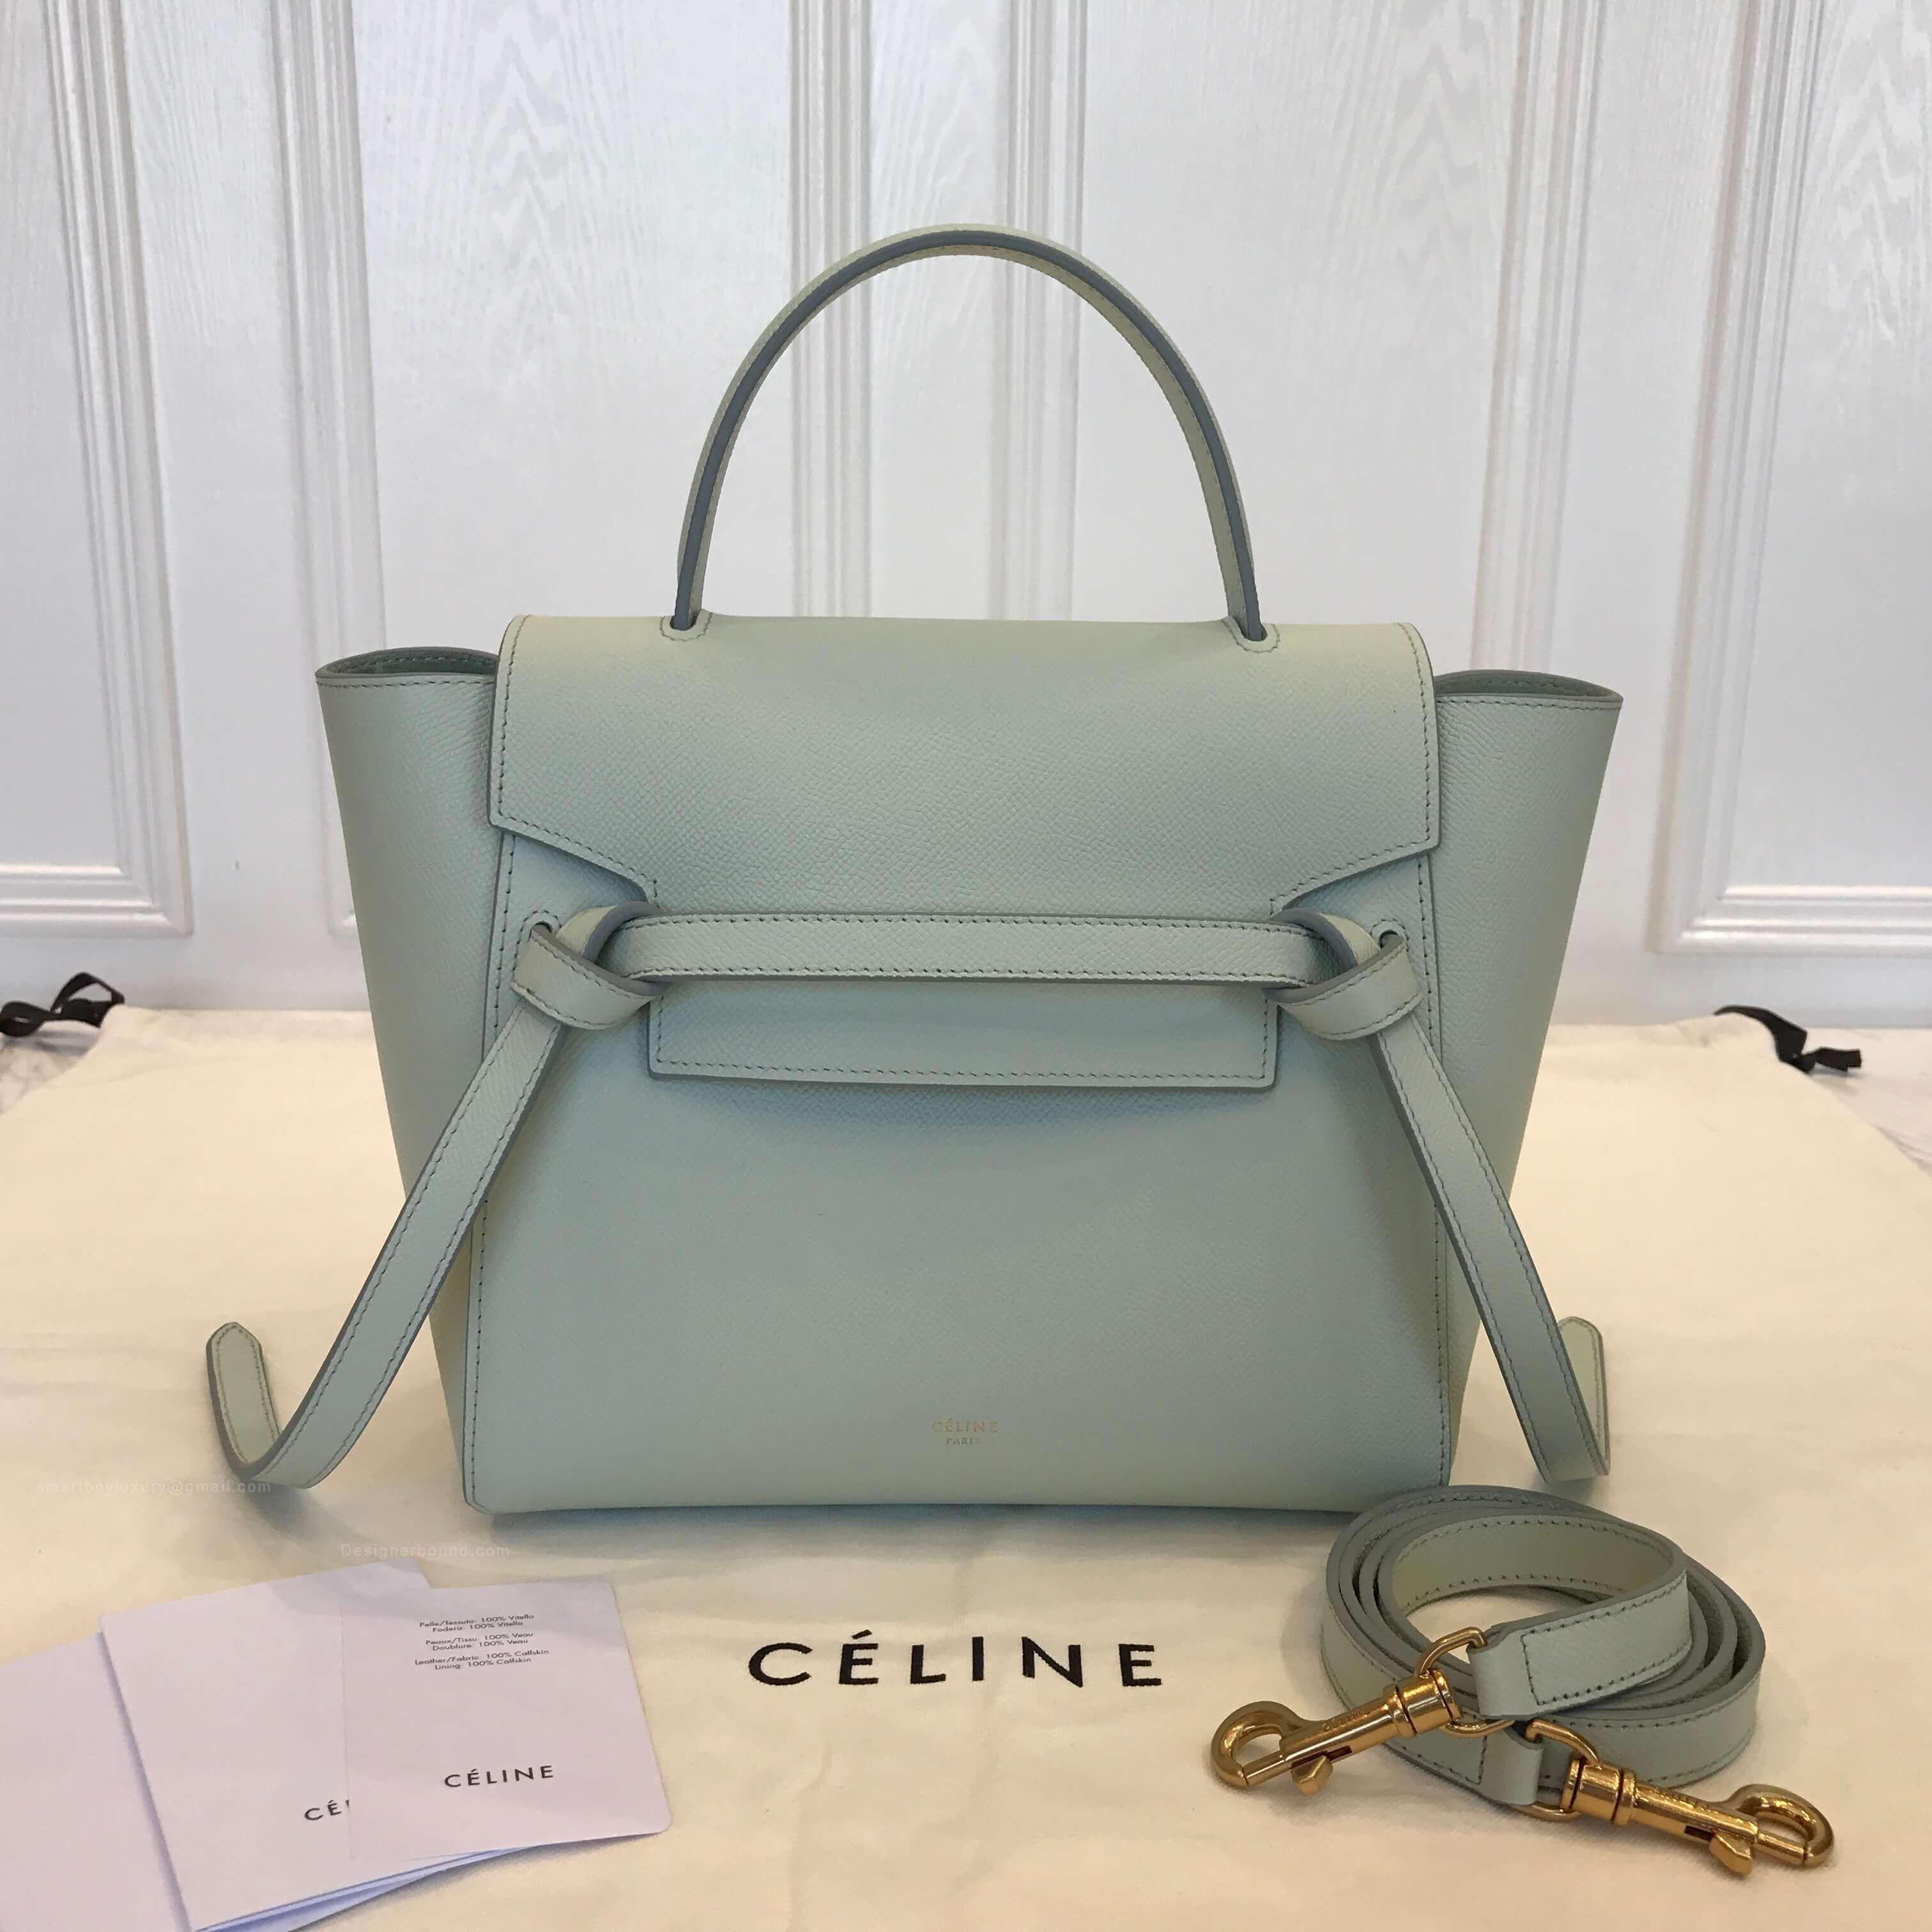 be4d4f9e7b Celine Micro Belt Bags - Identical Celine Replica - Designerbound.com